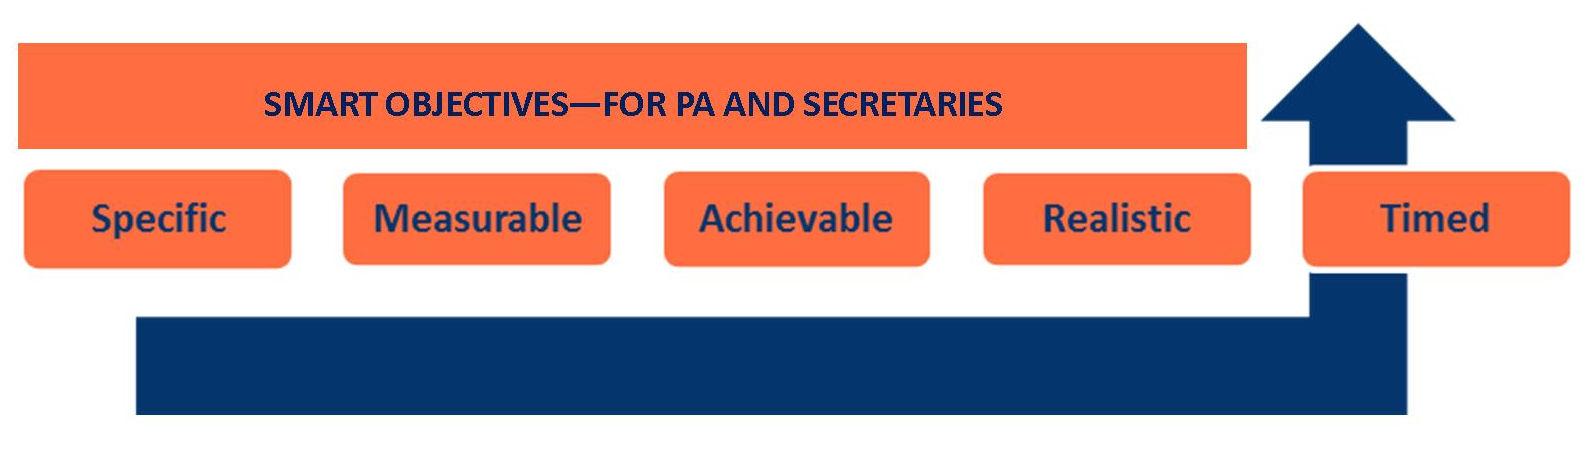 Smart Objectives for a Secretary